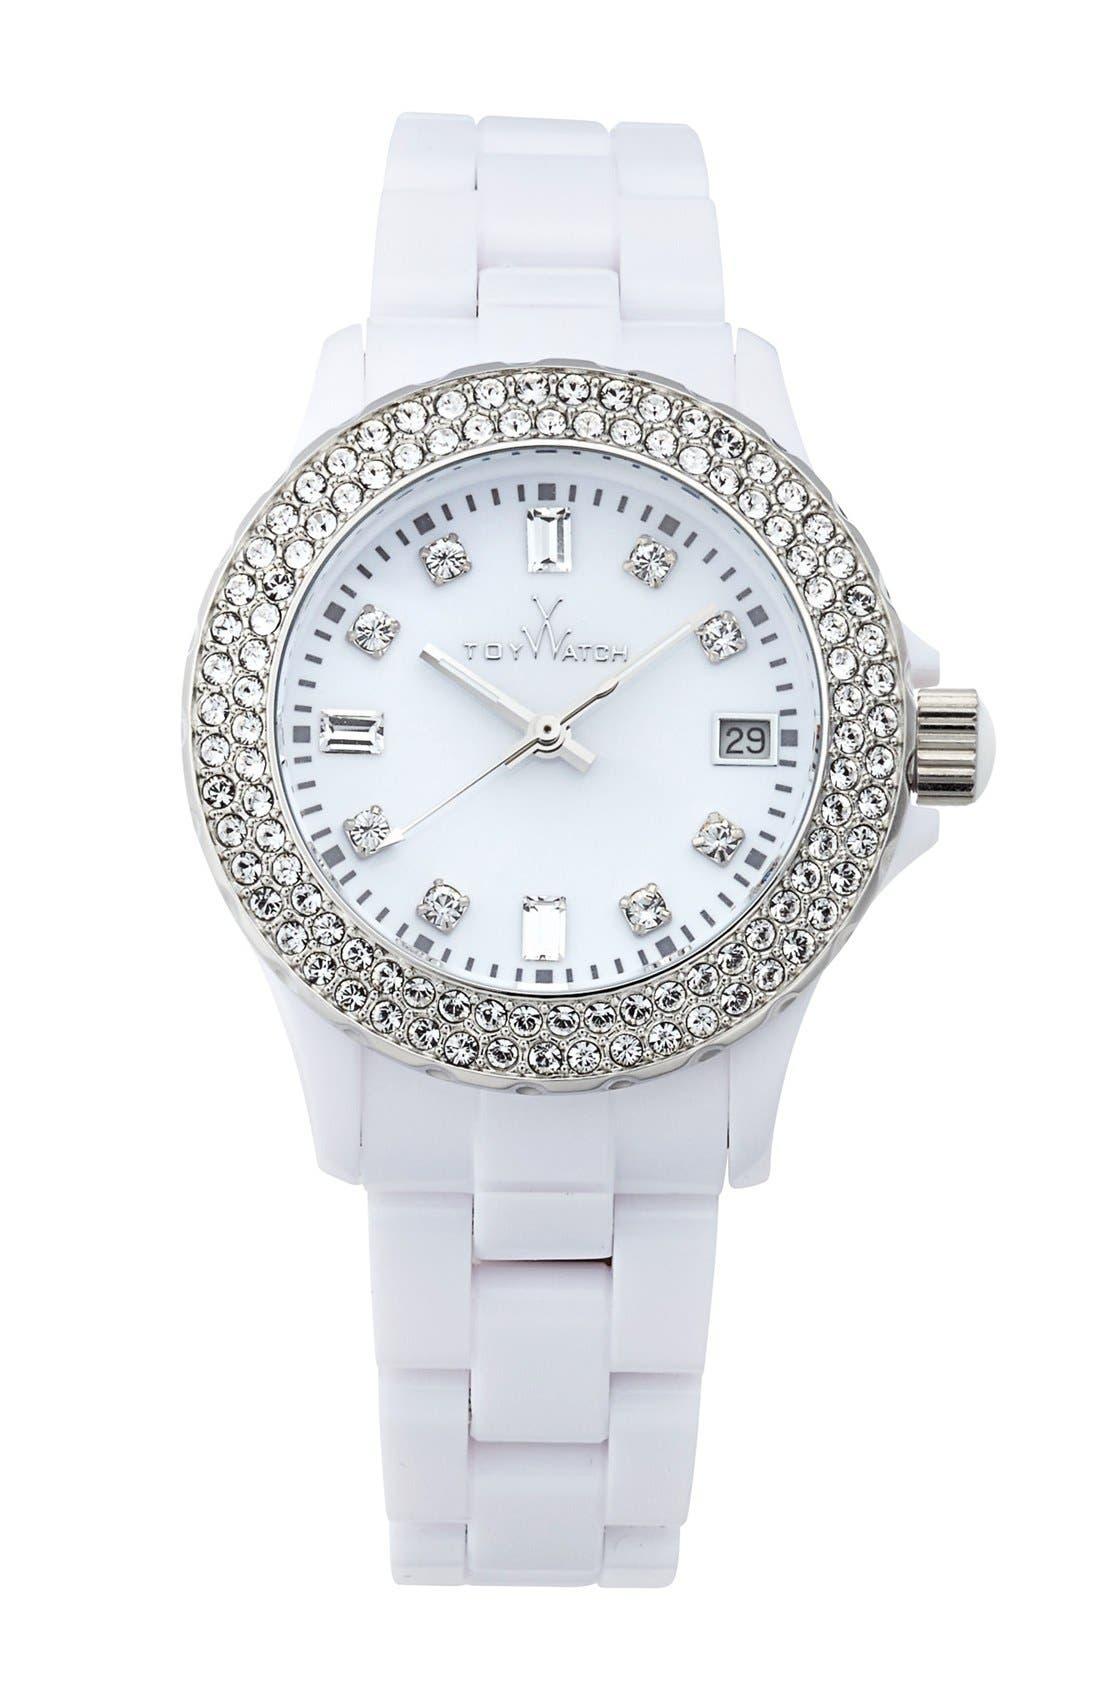 Main Image - TOYWATCH 'Plasteramic' Bracelet Watch, 35mm